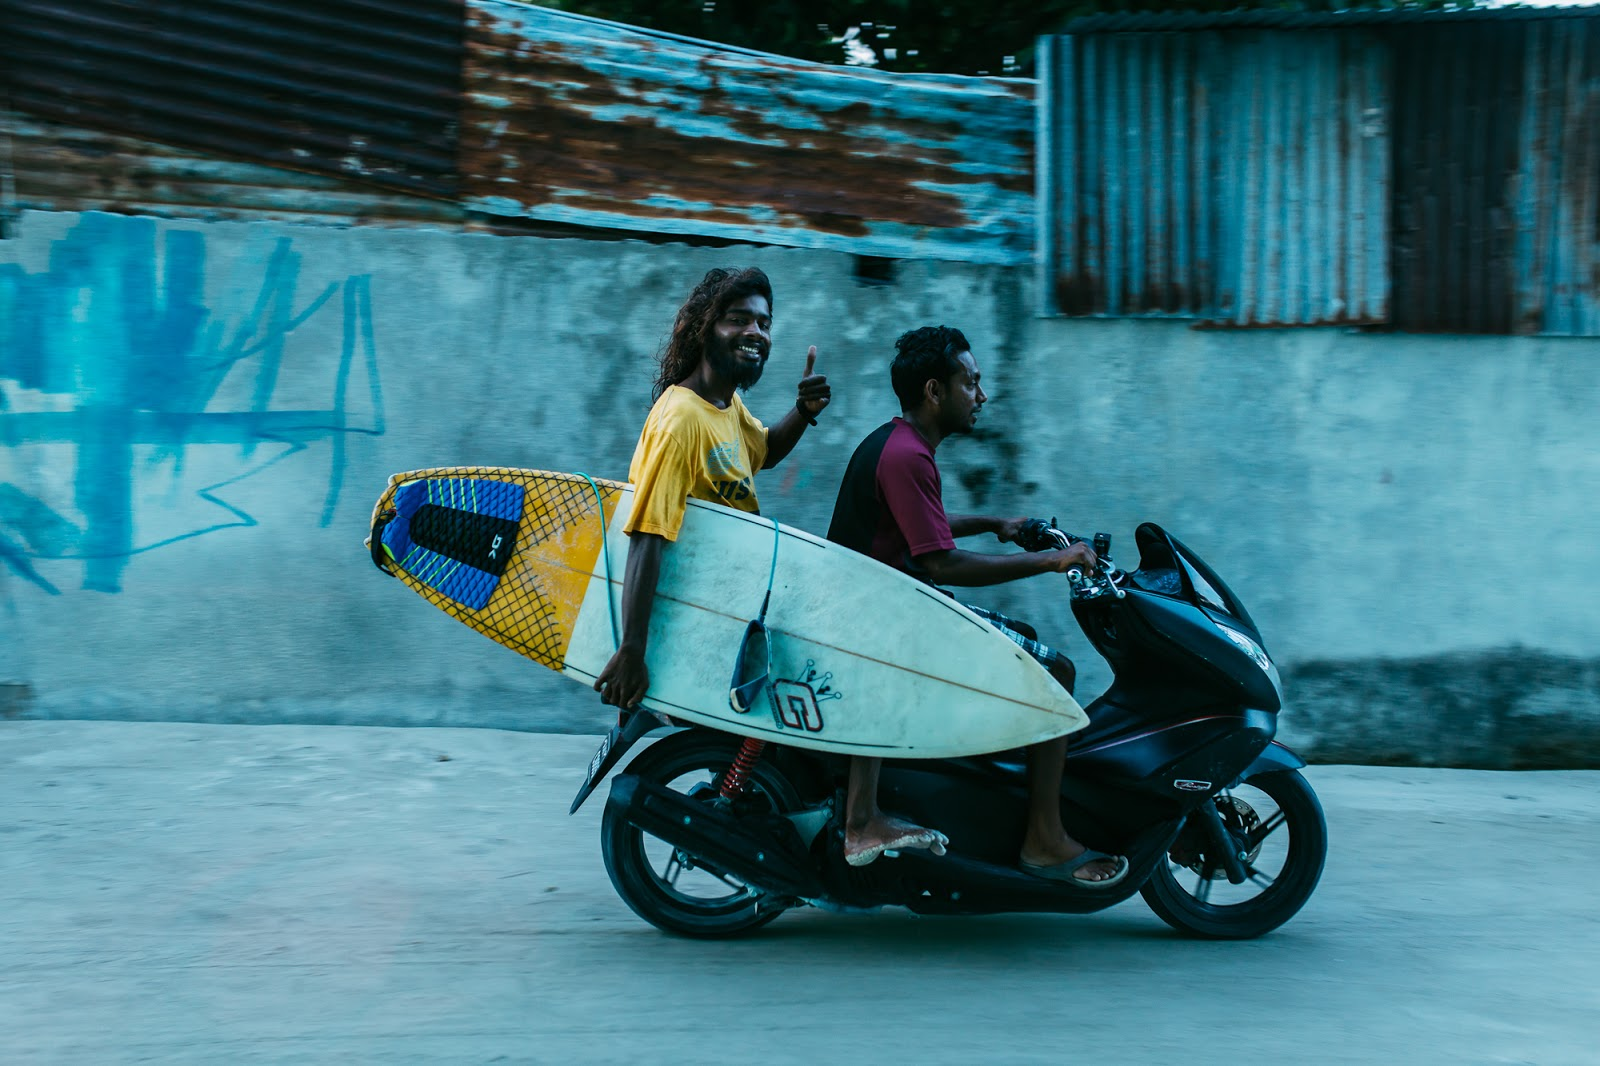 Local surf transfer in motorbike Maldives